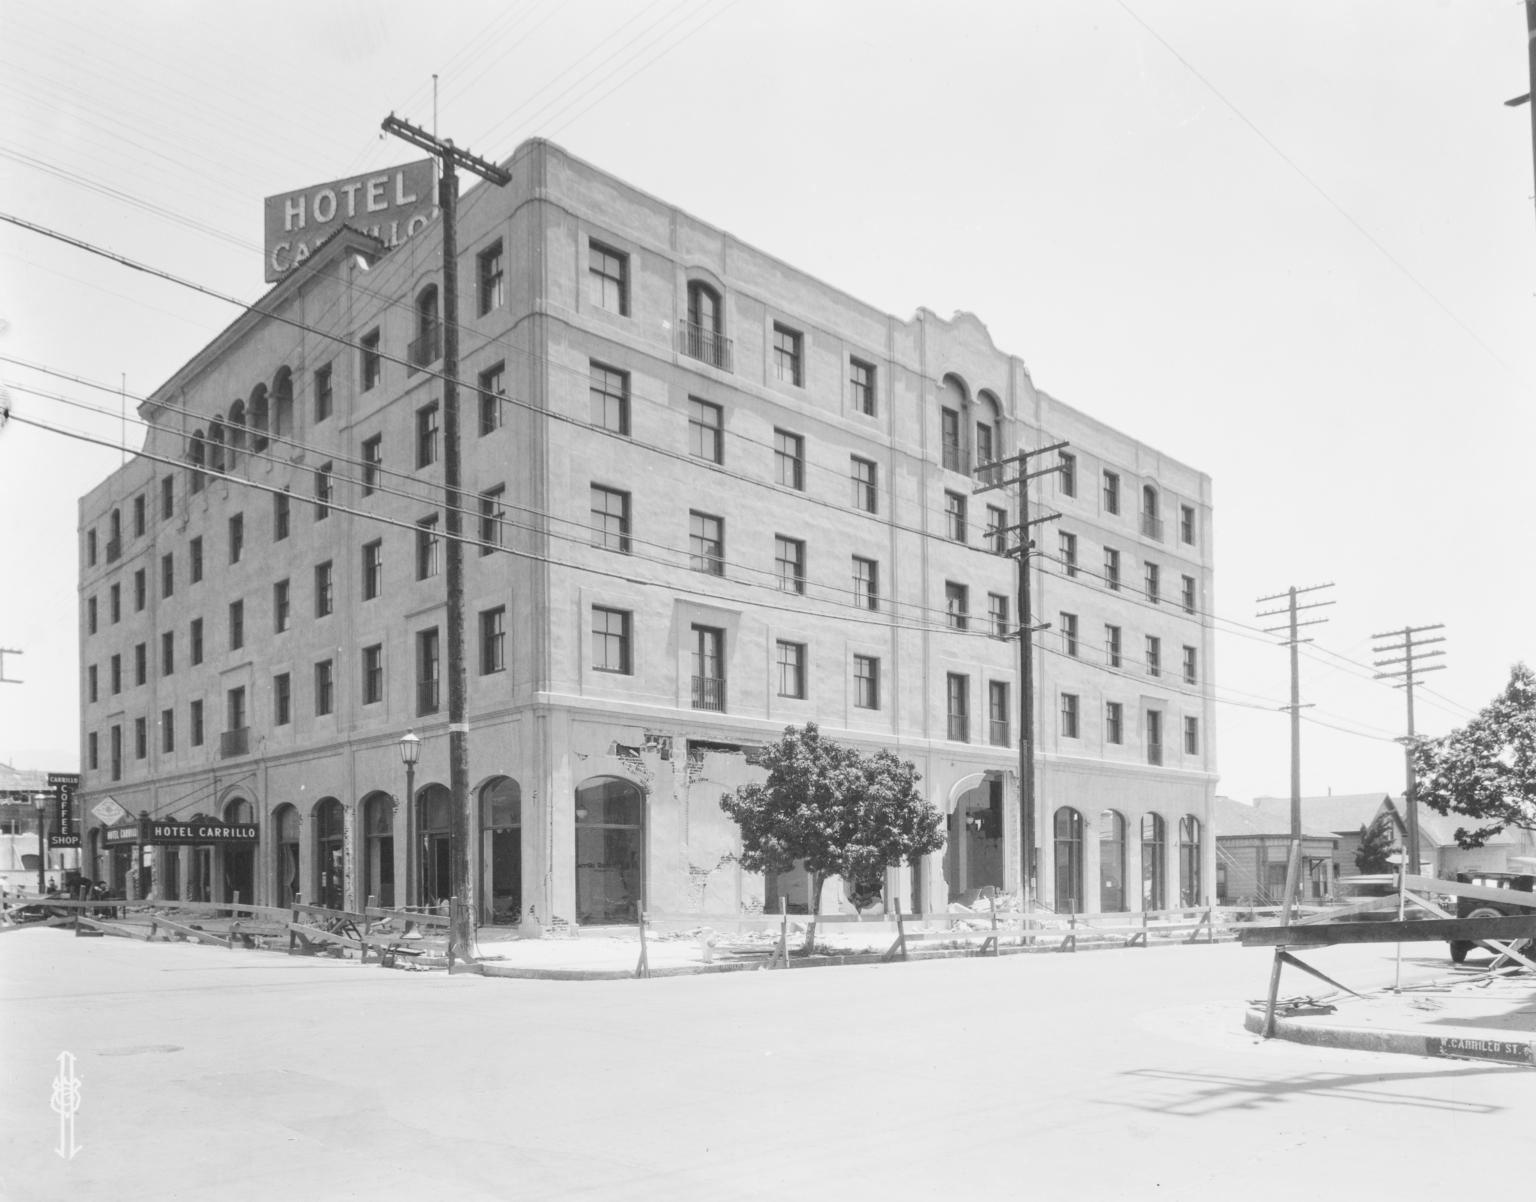 Santa Barbara 1925 Earthquake Damage - Hotel